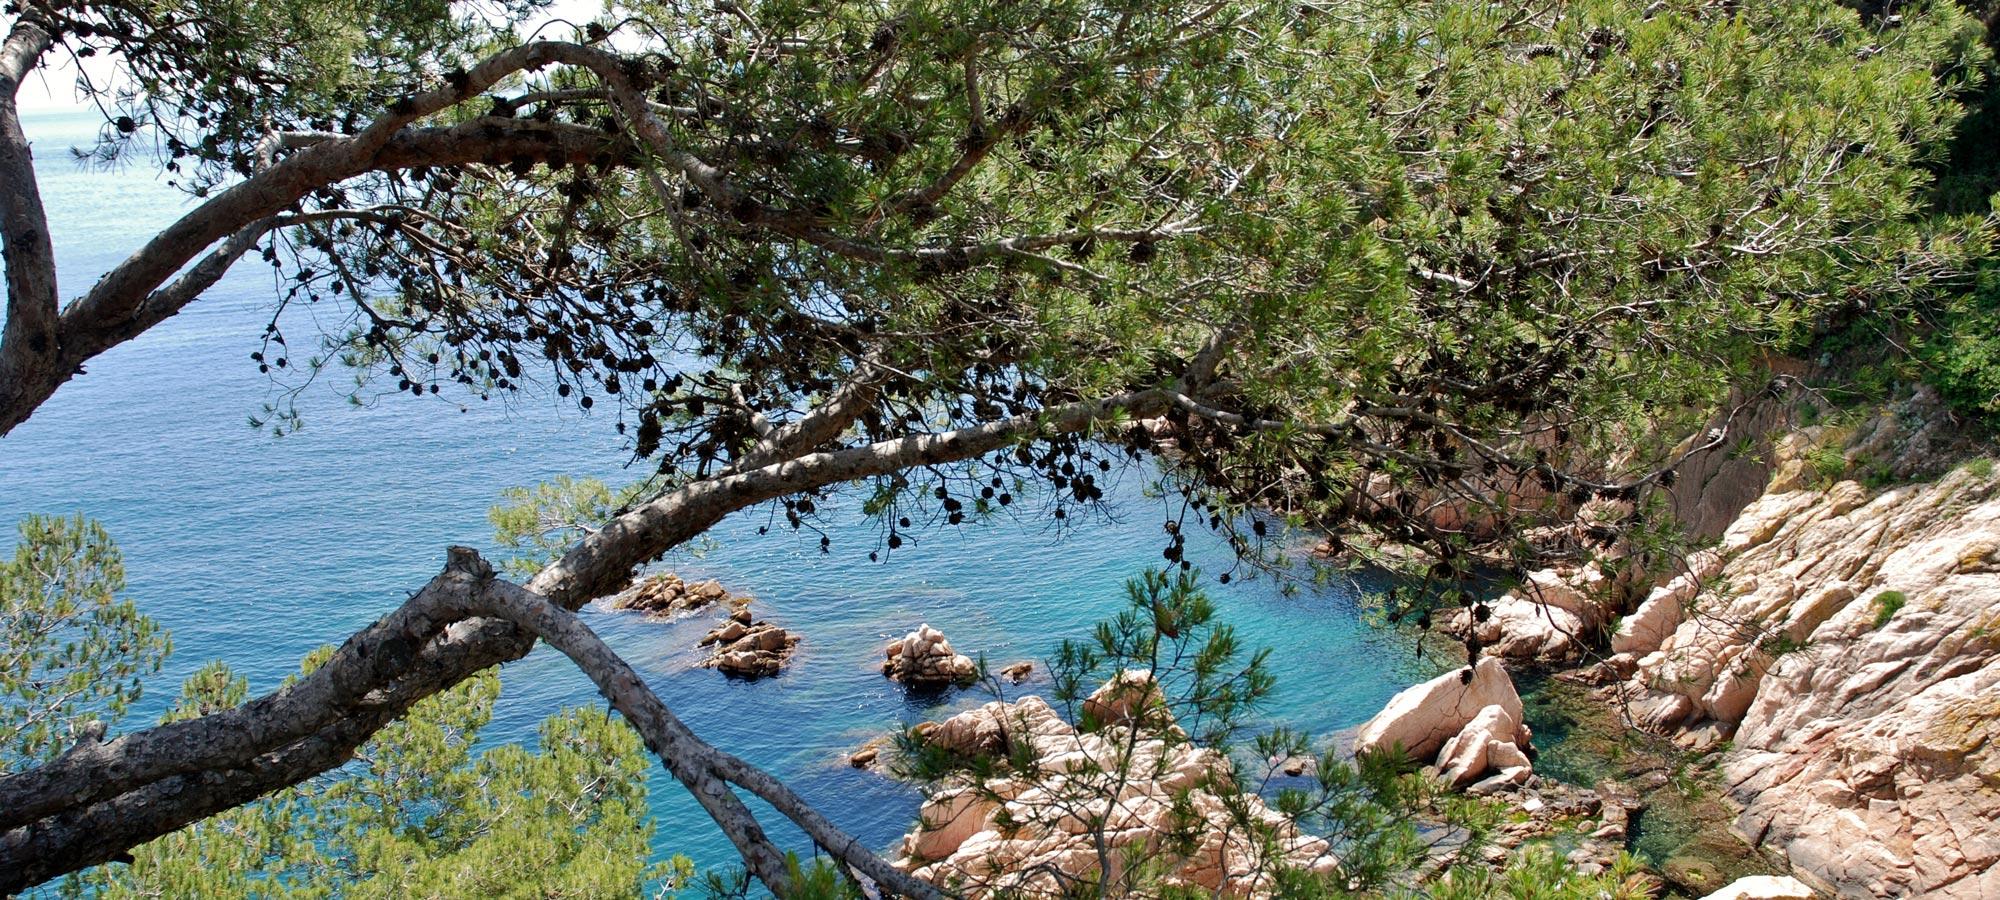 Sant Feliu de Guíxols - Mirador al Passeig marítim del President Josep Irla